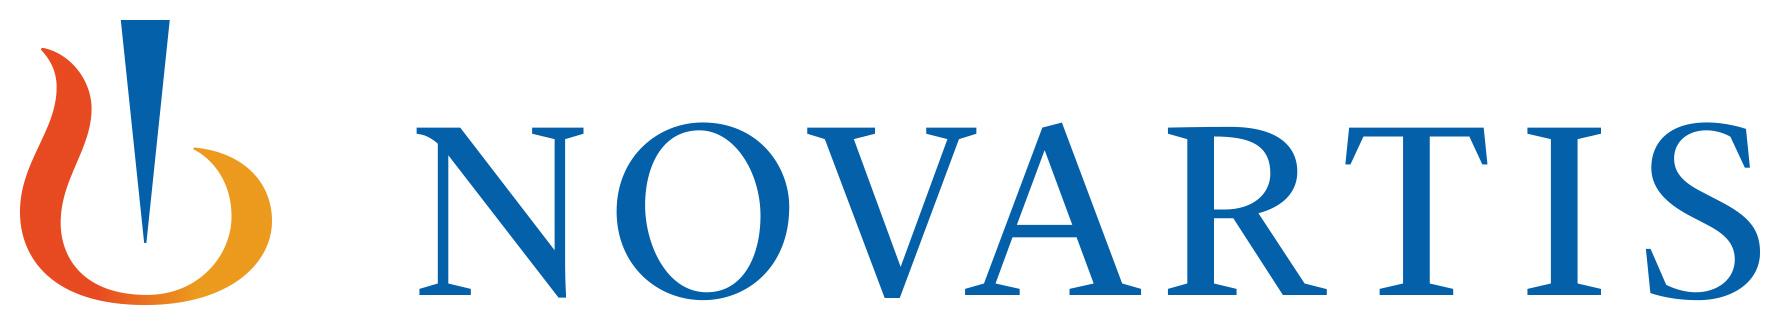 Novartis partner partenaire